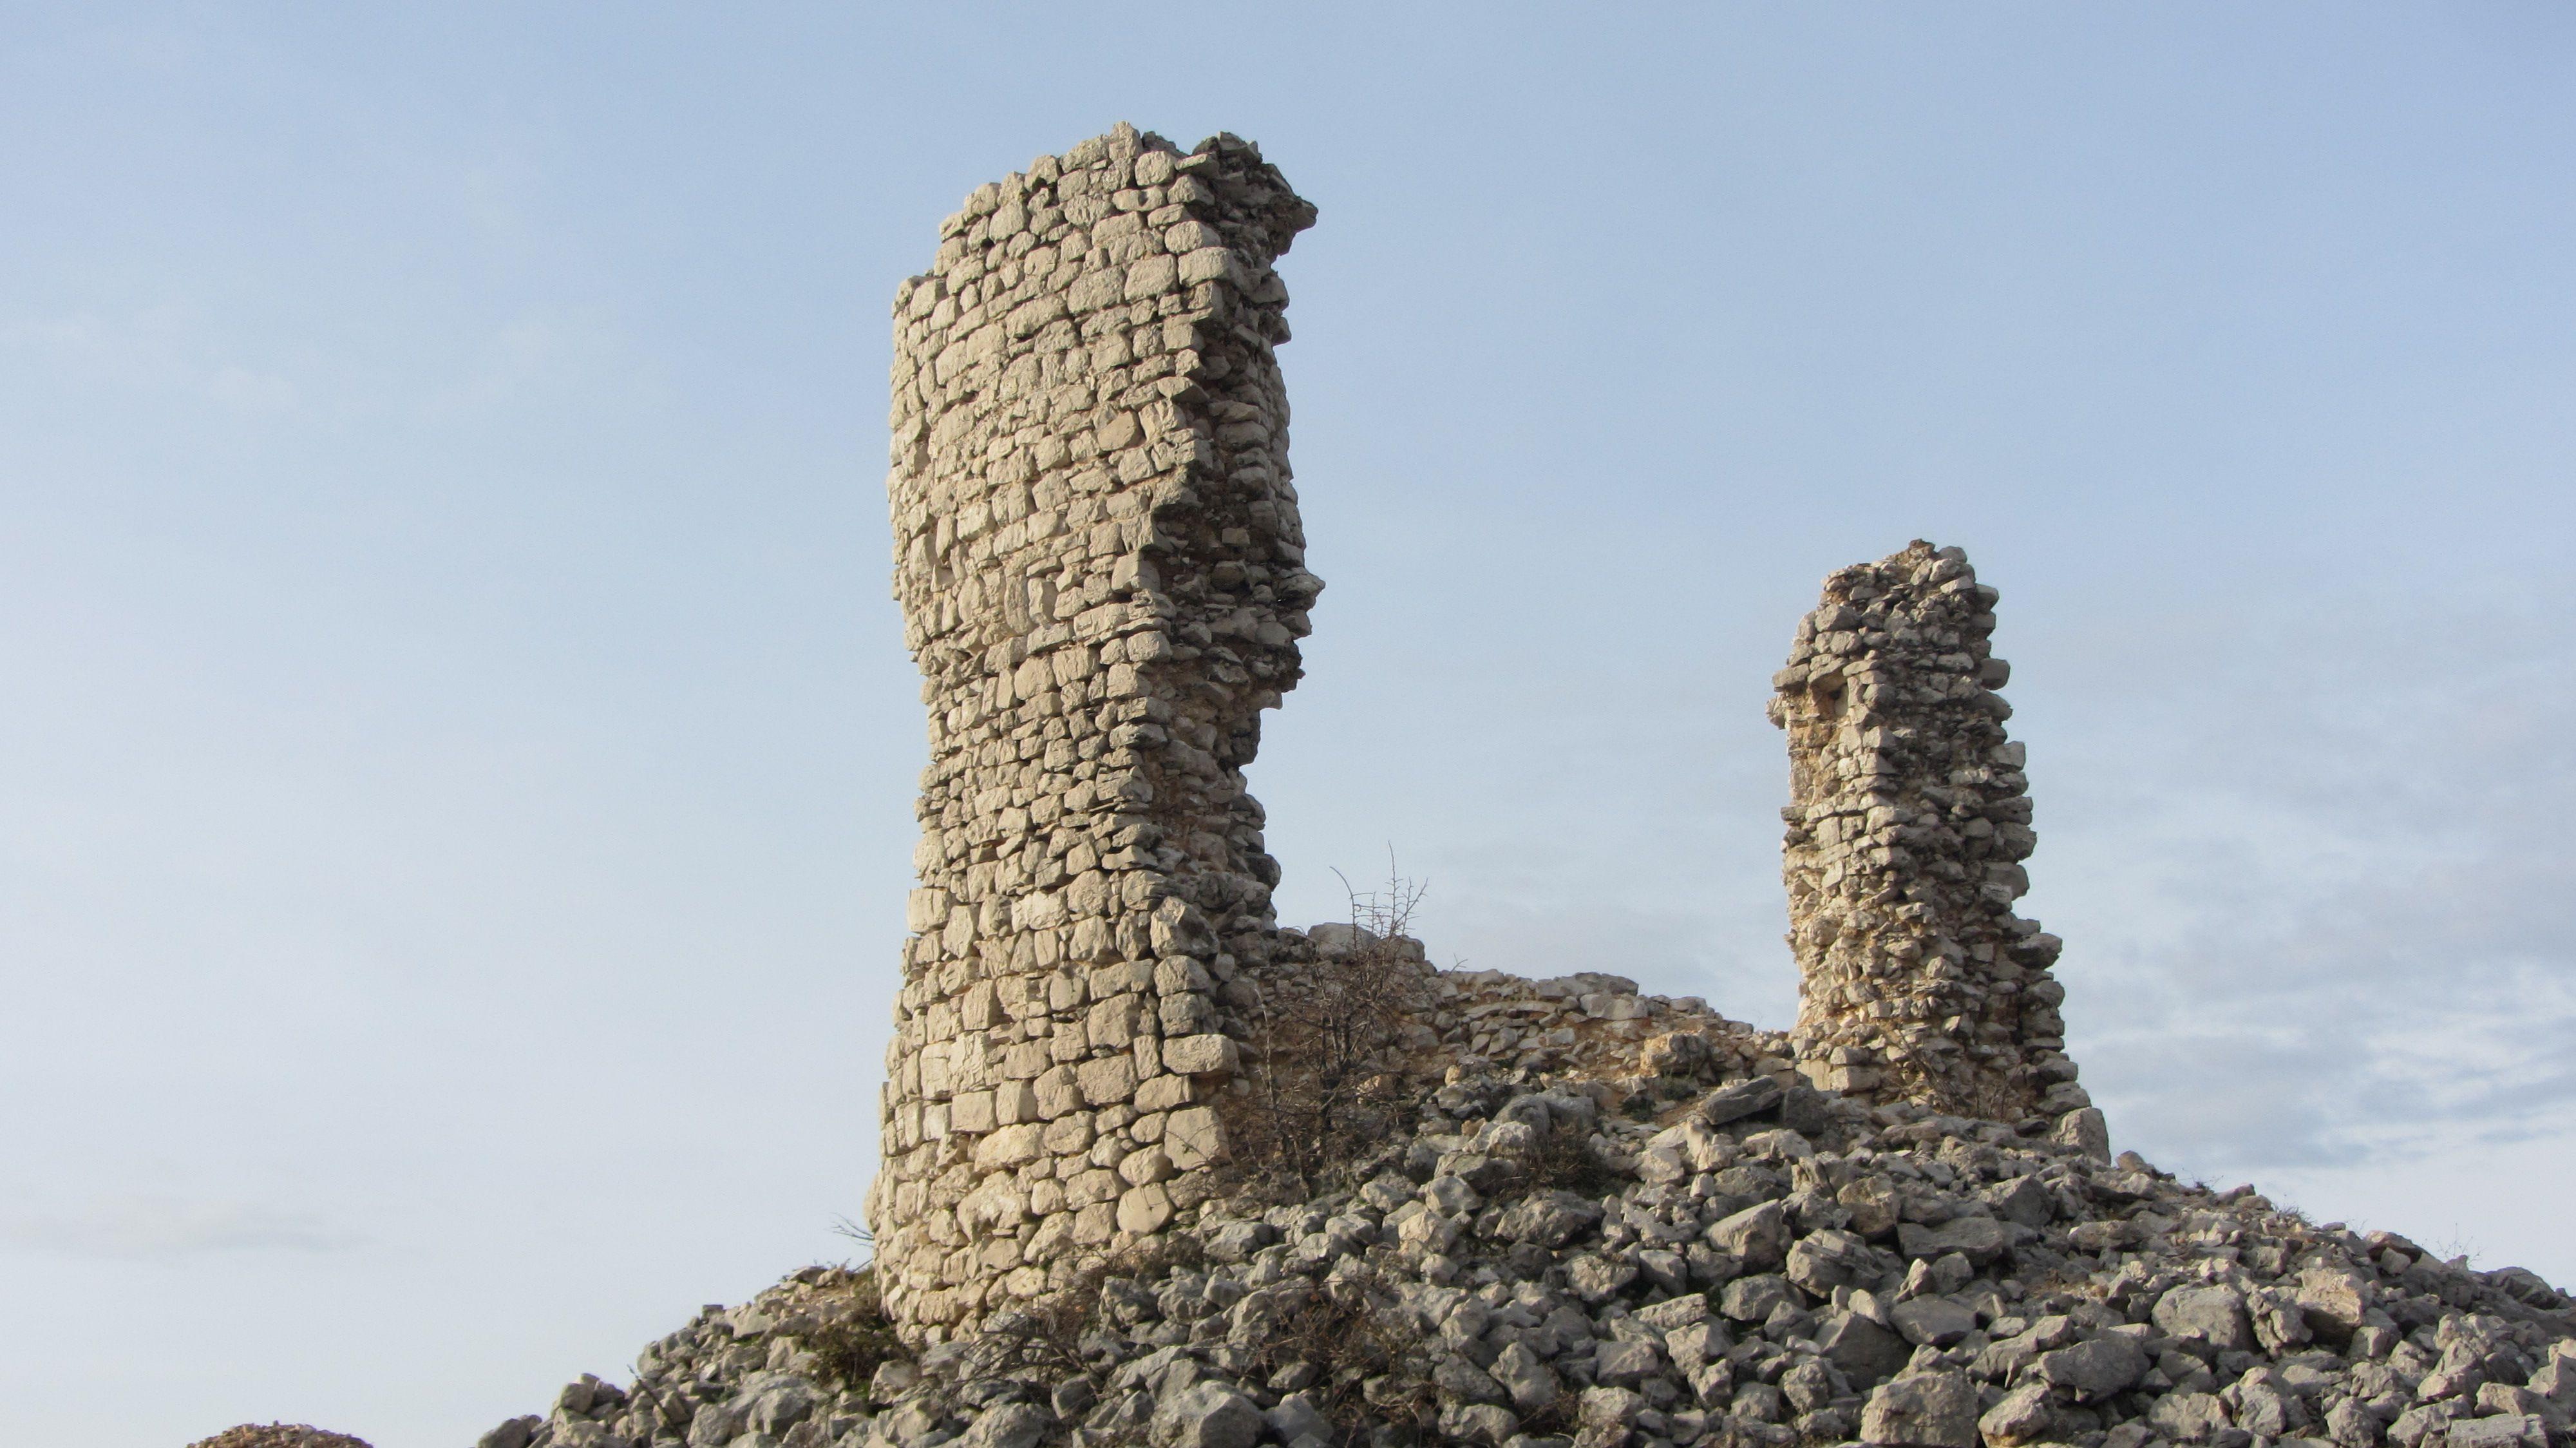 Leftovers Of The Tower On The Hill Kastelina Near Kasic Banjevci Sibenik Knin County Sibenik Beautiful Croatia